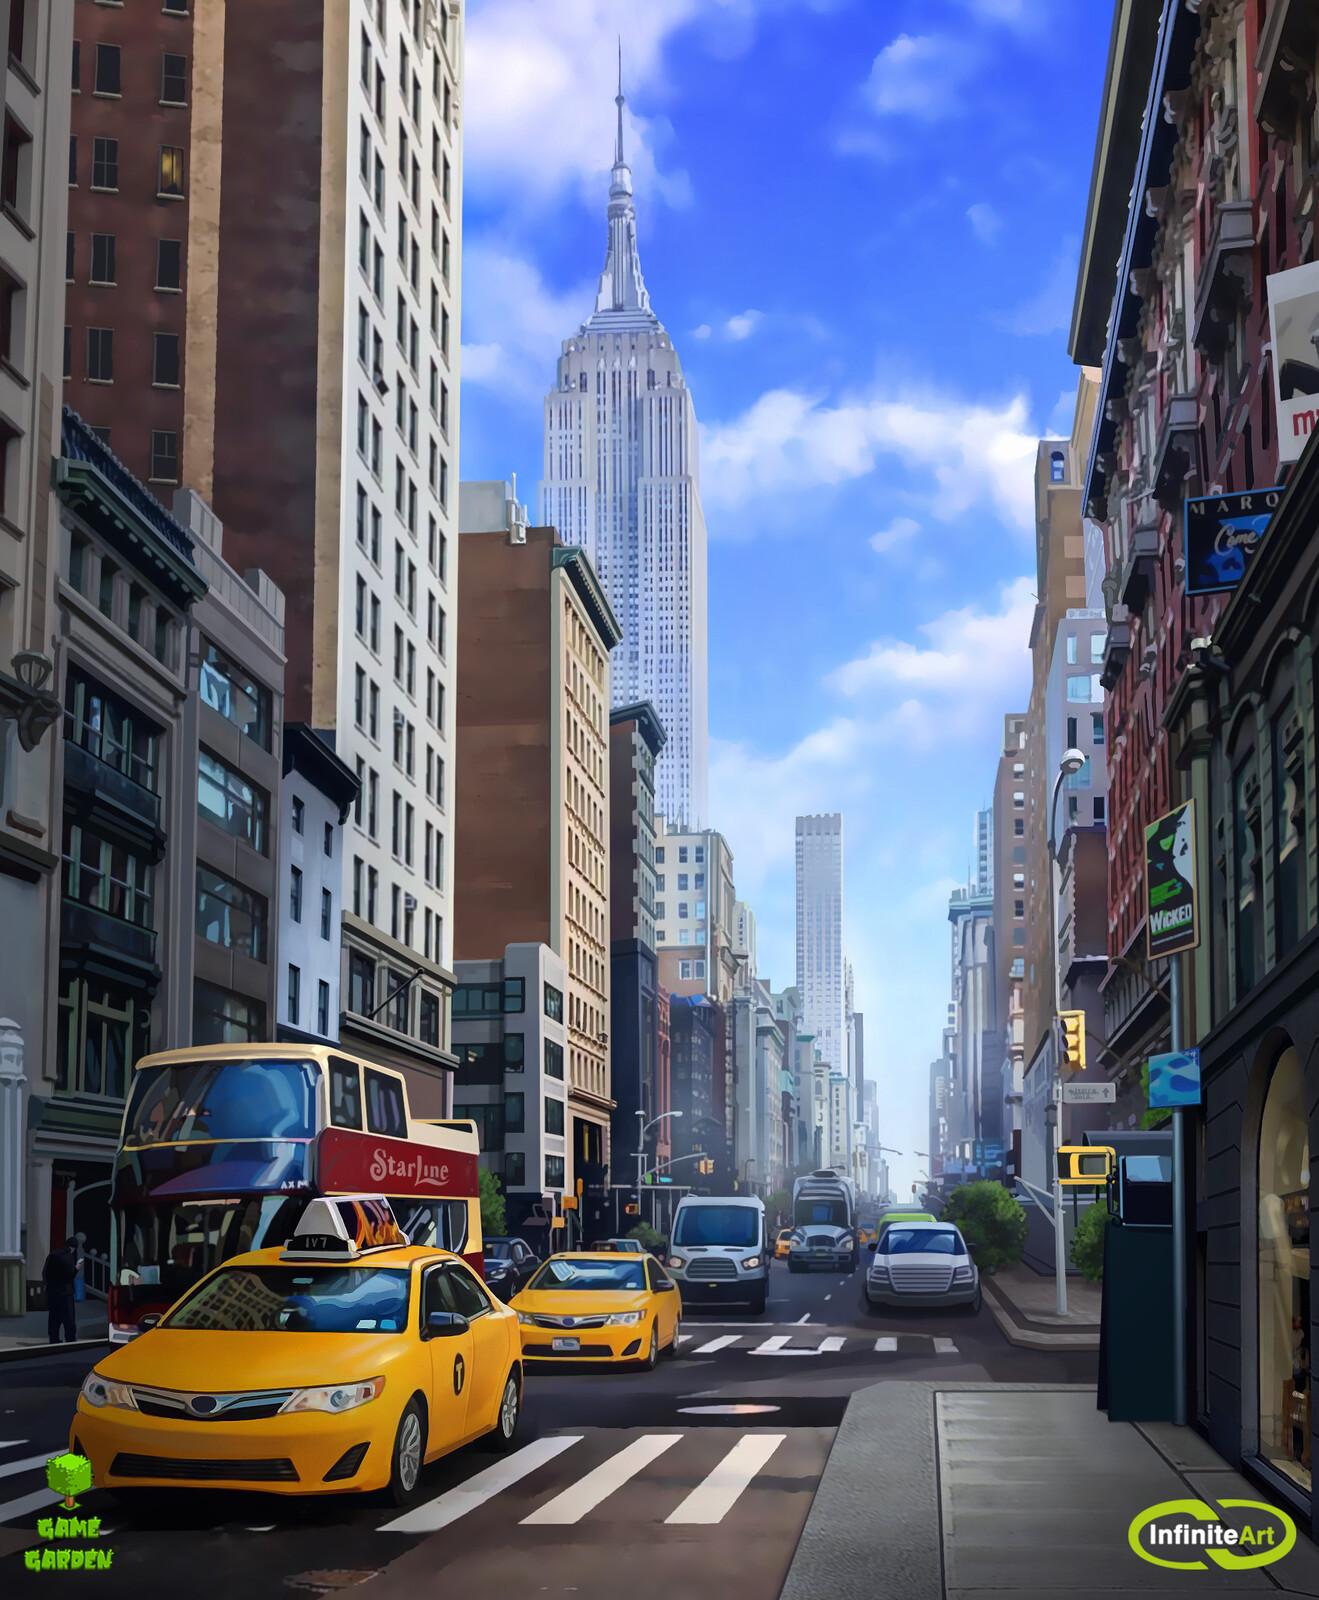 NYC Street (12 hours)